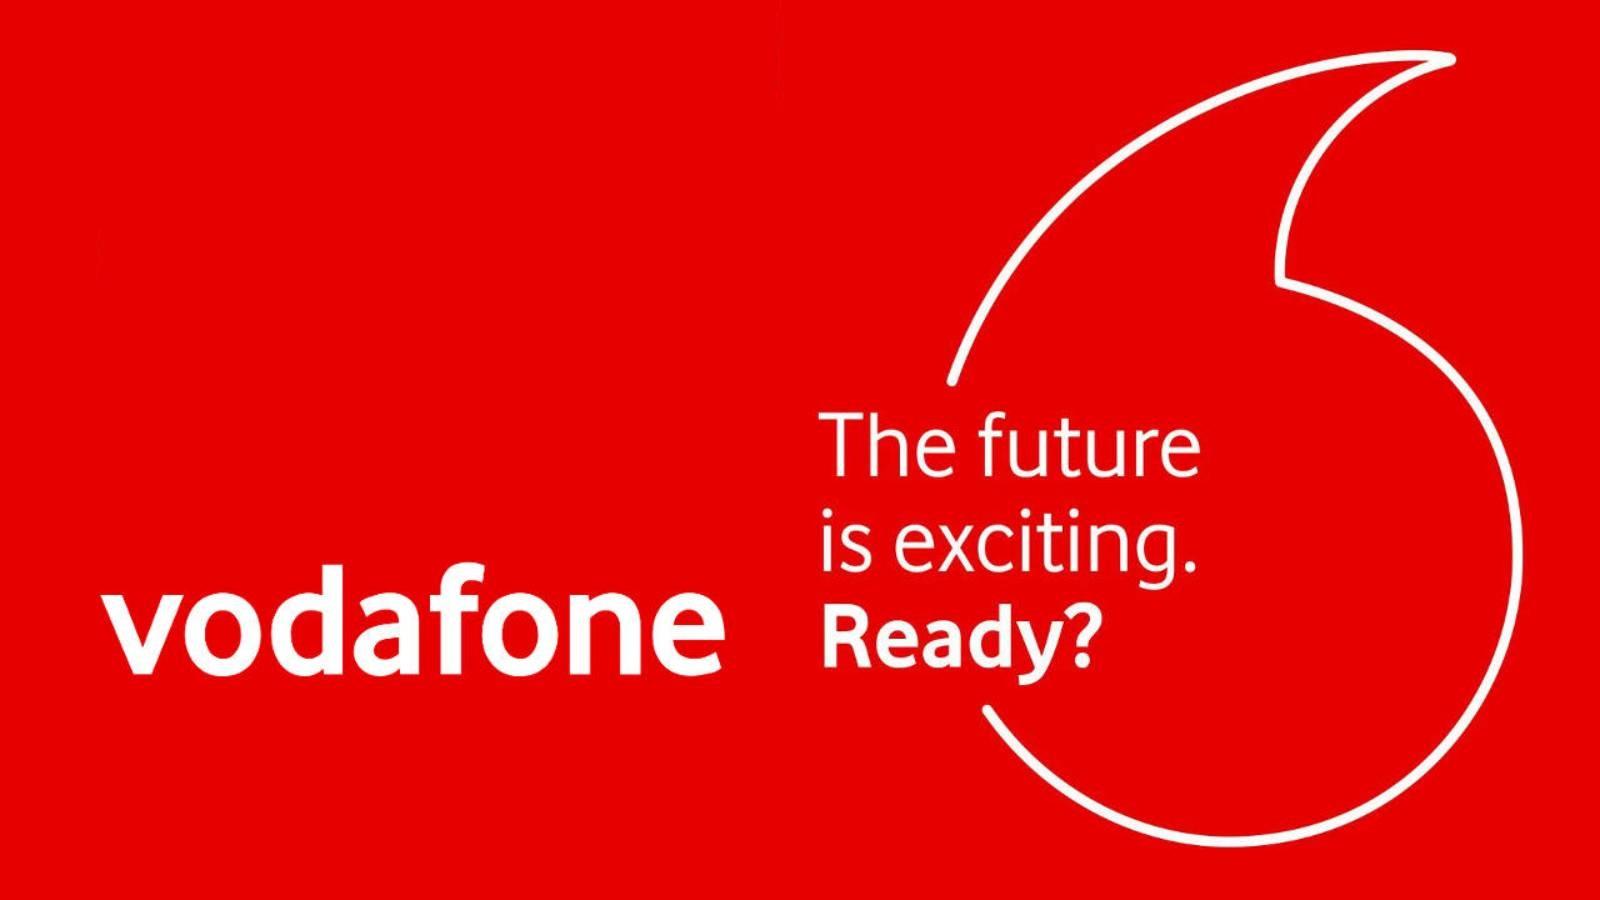 Vodafone Insight